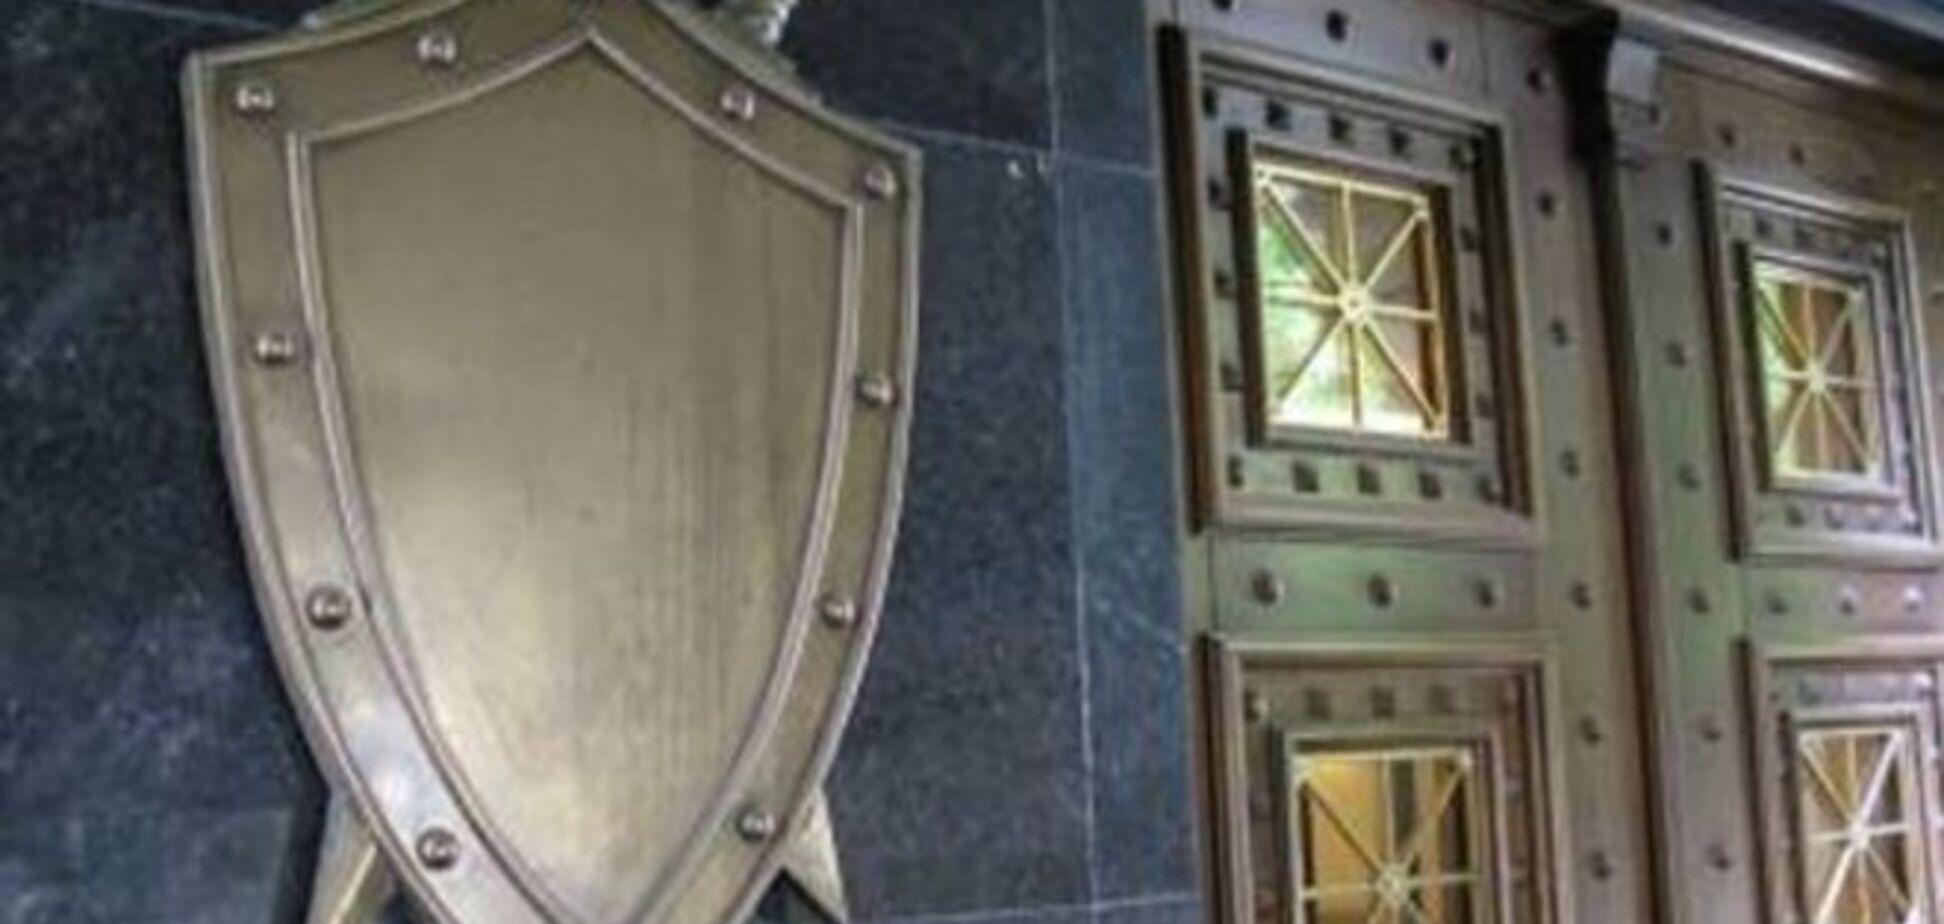 ГПУ объявила 'ДНР' и 'ЛНР' террористическими организациями